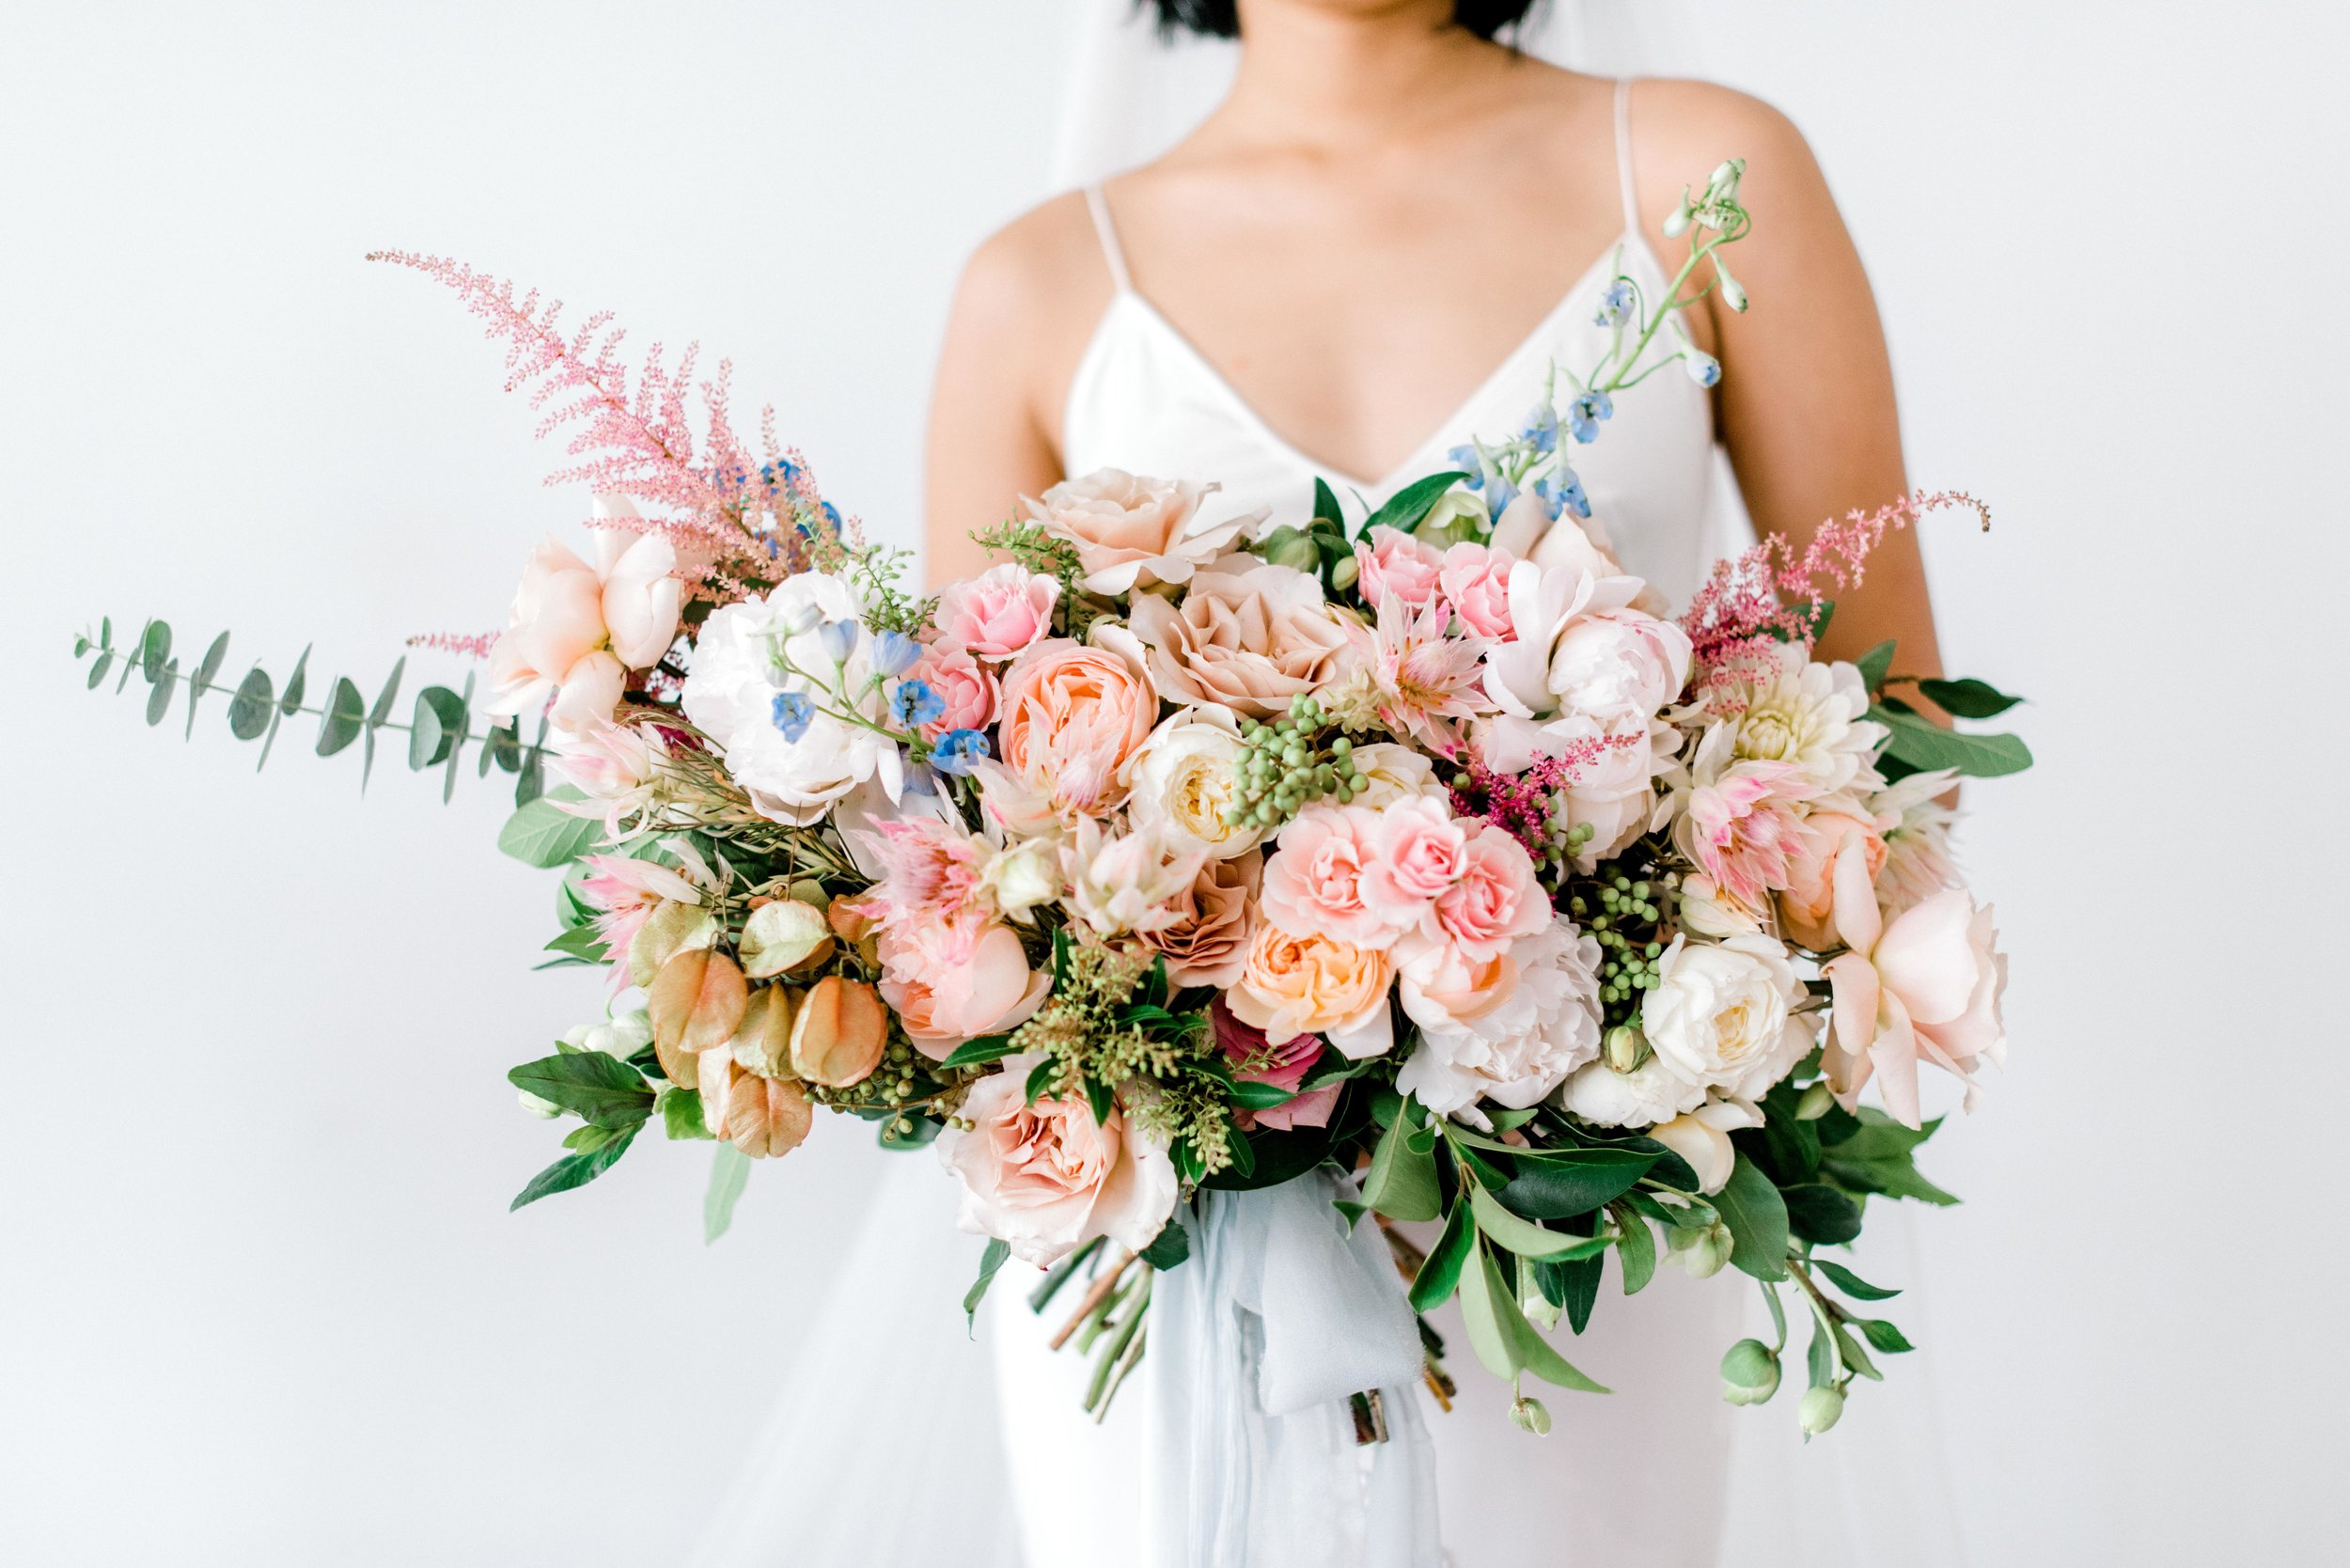 Houston-Wedding-Photographer-Editorial-Fine-Art-Film-Destination-Dallas-Texas-Mibellarosa-Josh-Dana-Fernandez-Photography-4.jpg